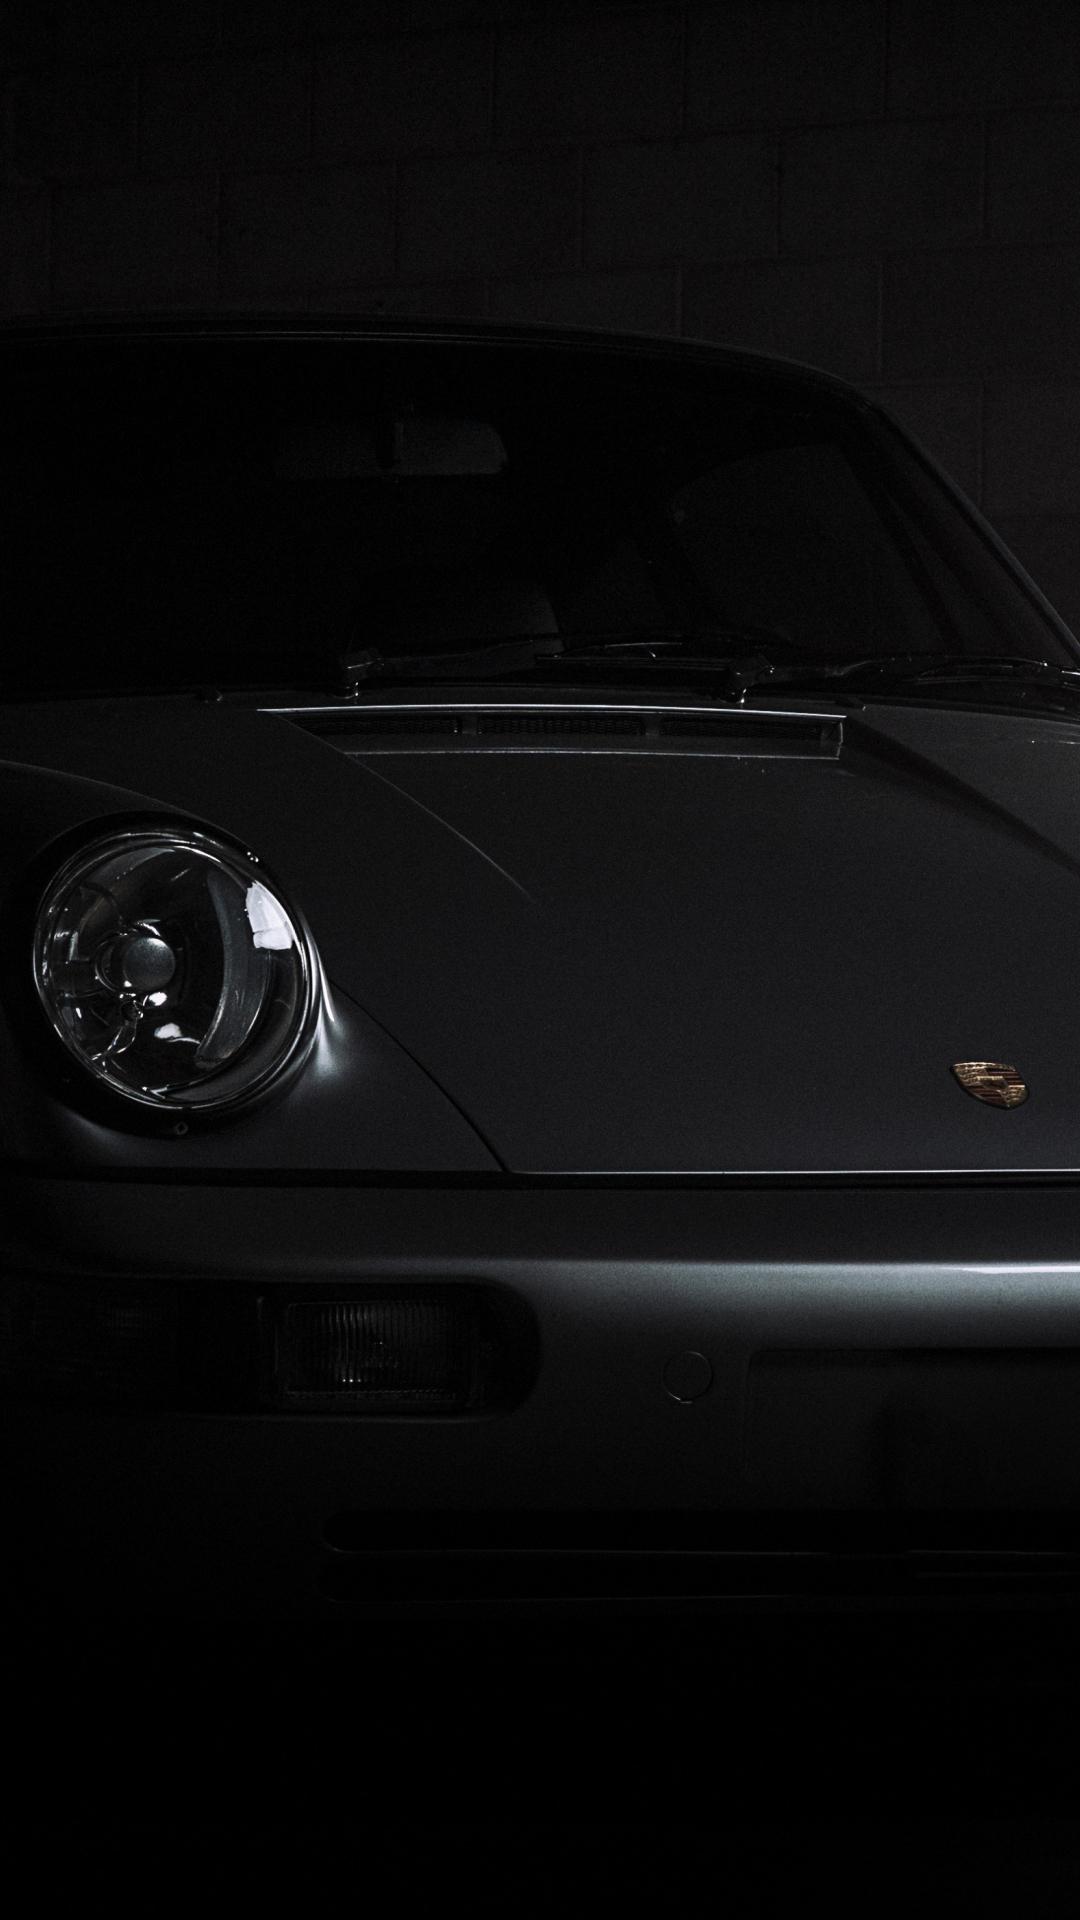 Download 1080x1920 Wallpaper Porsche 911 Carrera Front Dark